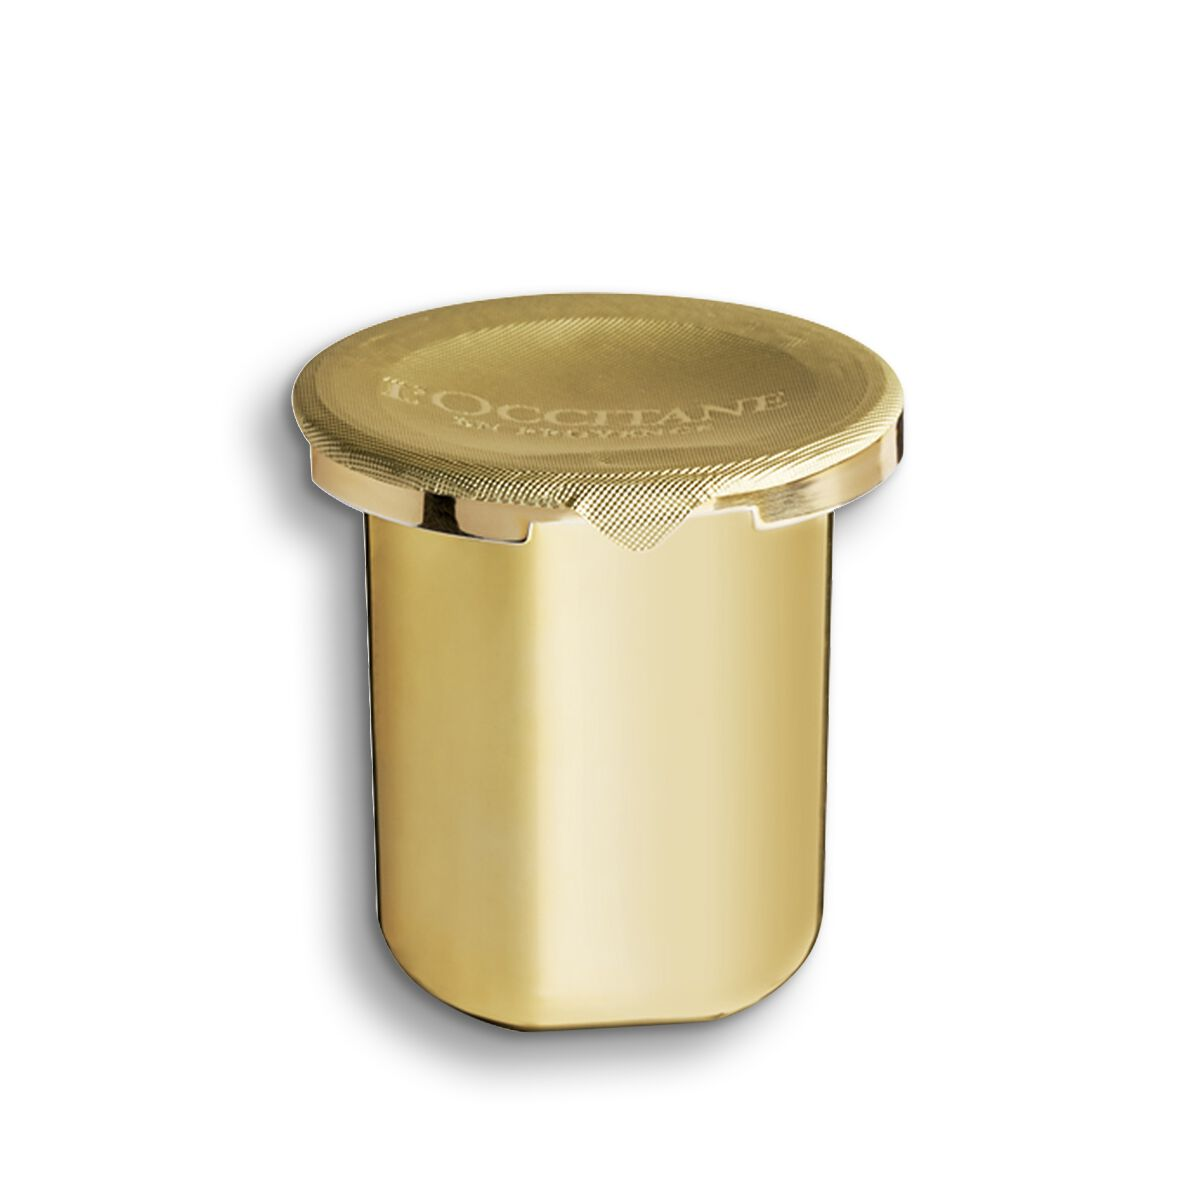 Harmonie Divine Cream Refill 50 ml. - L'OCCITANE